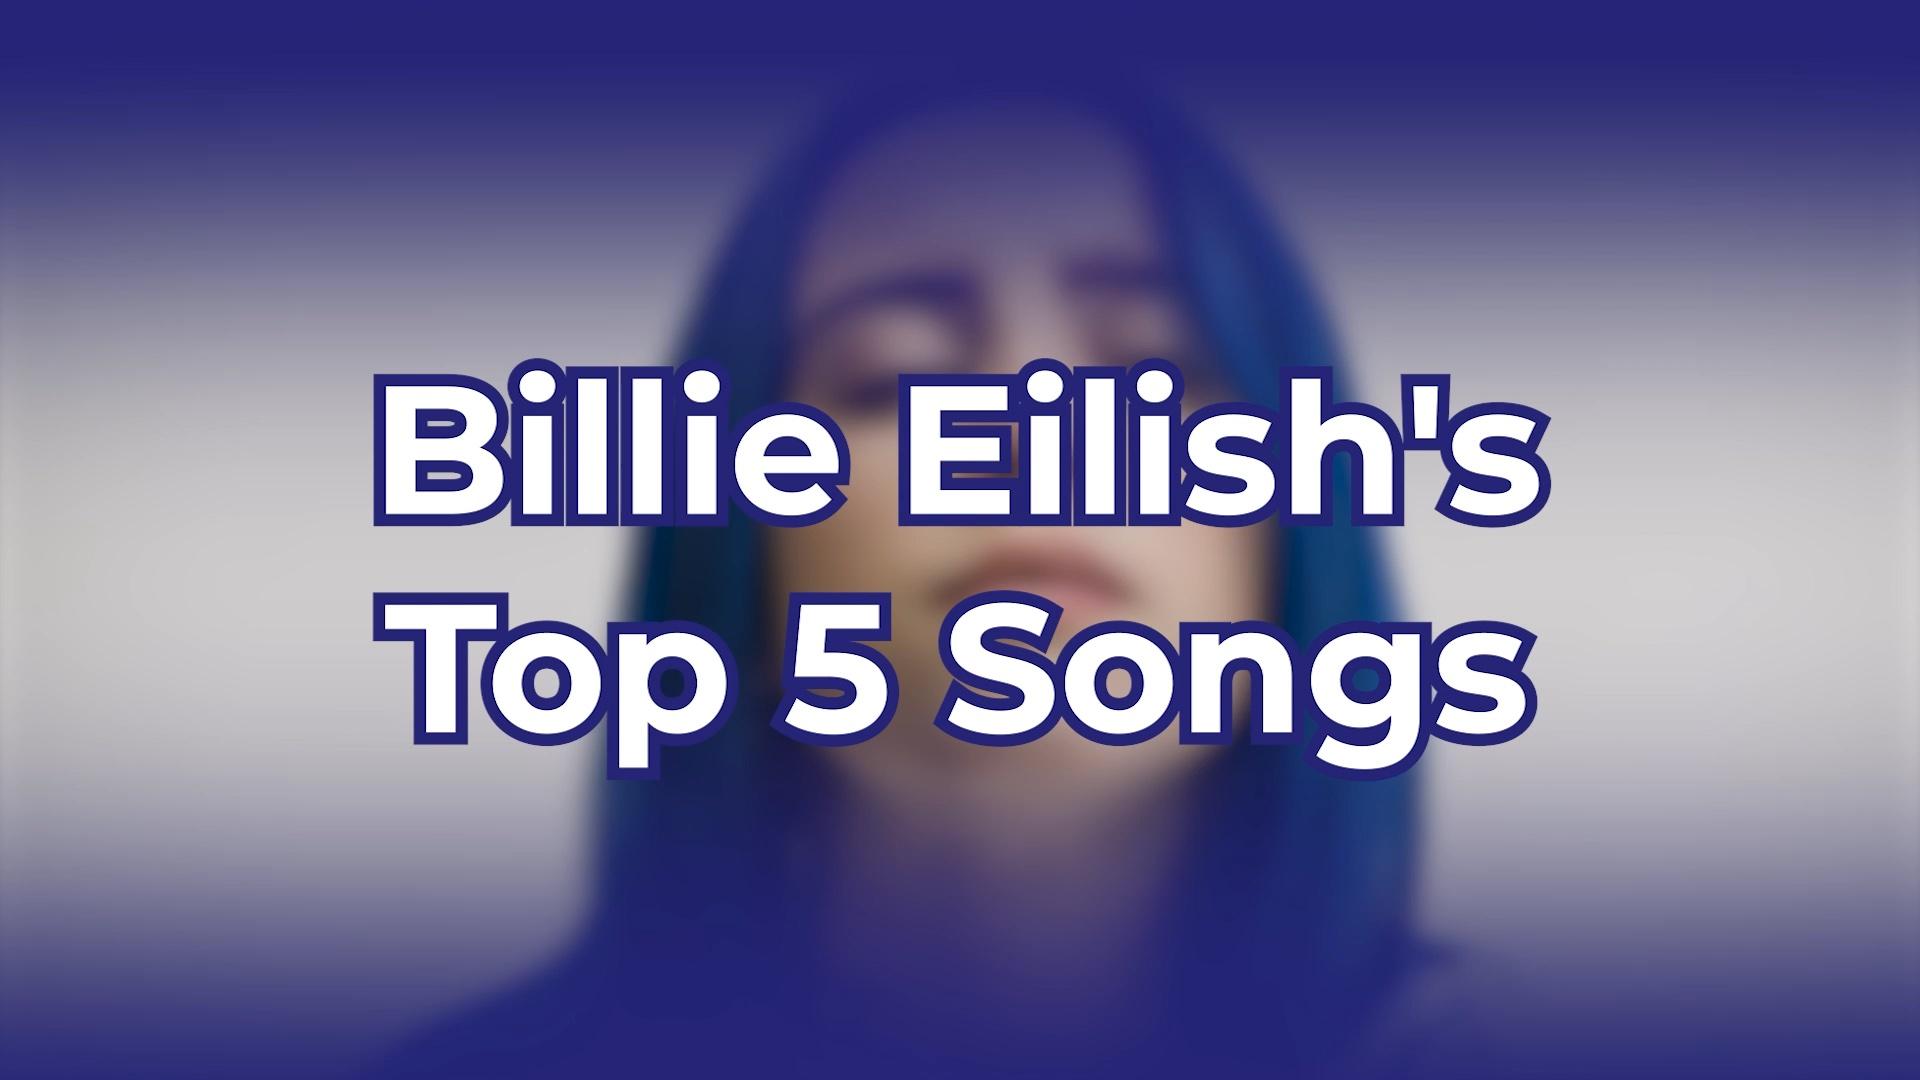 Billie Eilish's Top 5 Songs